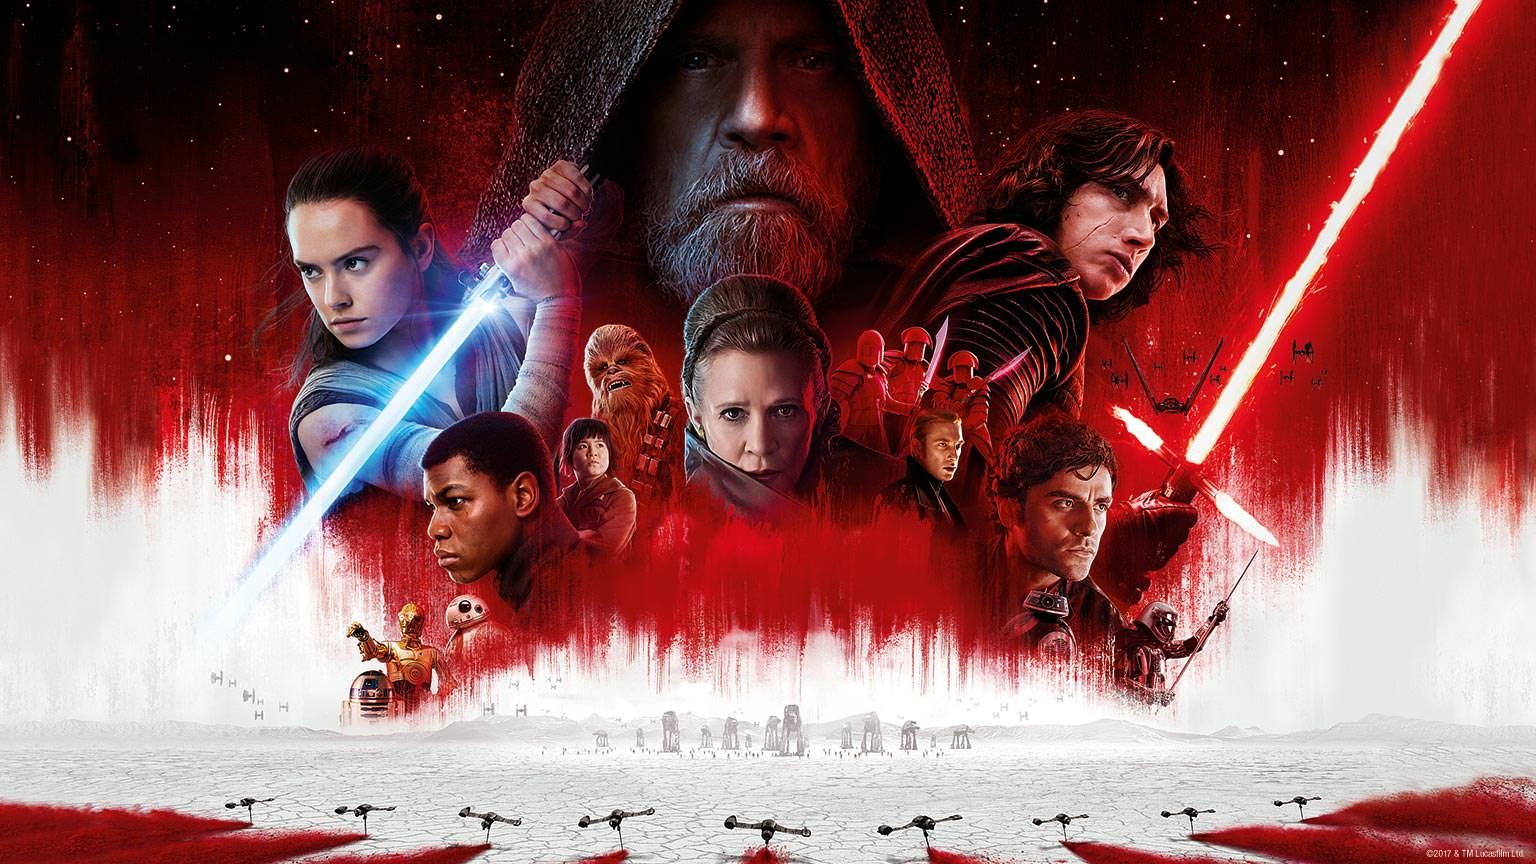 Star Wars: The Last Jedi Imax สตาร์ วอร์ส: ปัจฉิมบทแห่งเจได